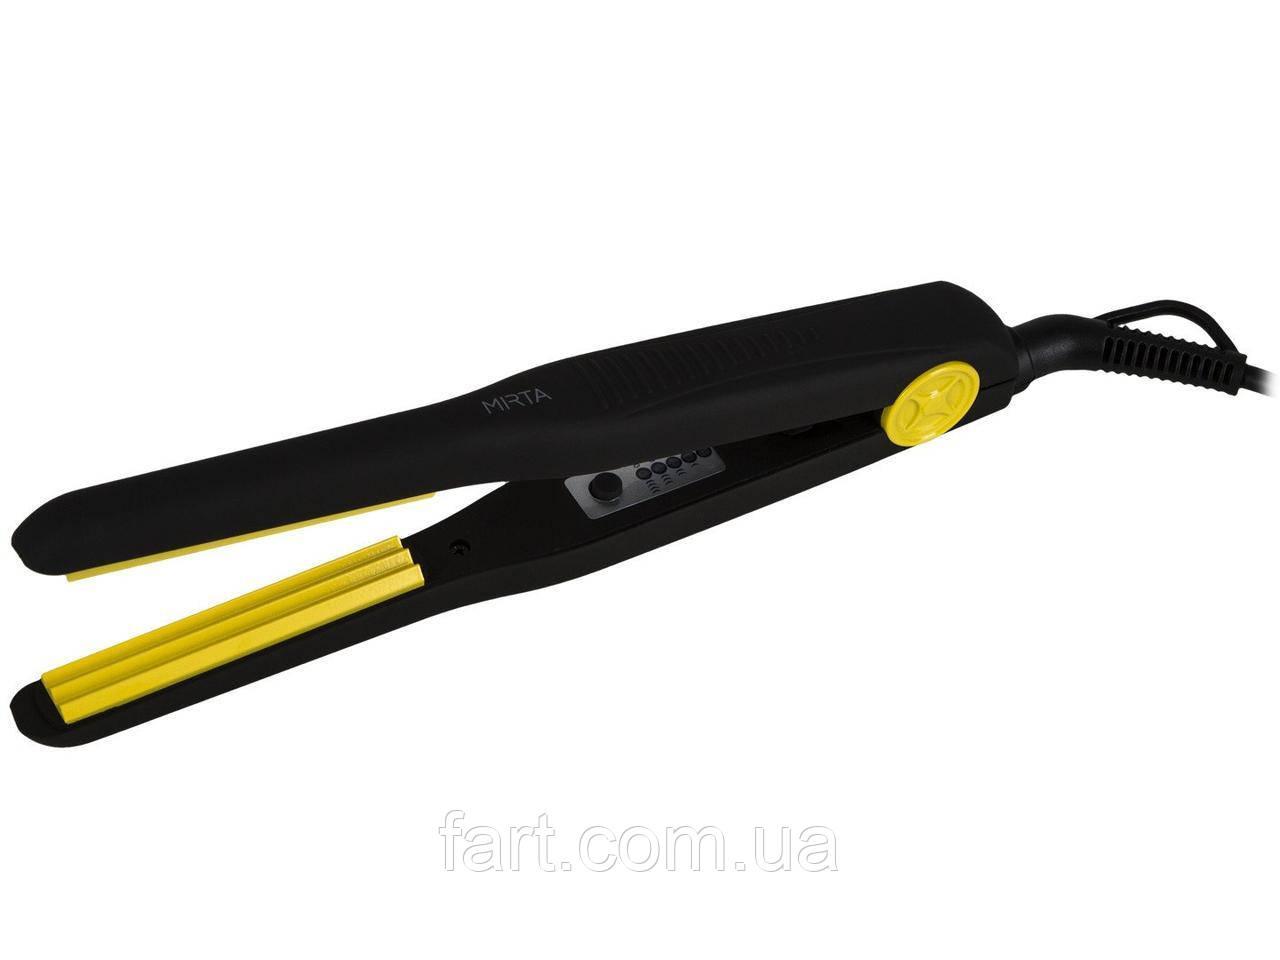 Гофре для прикорневого объема волос MIRTA HS-5125Y